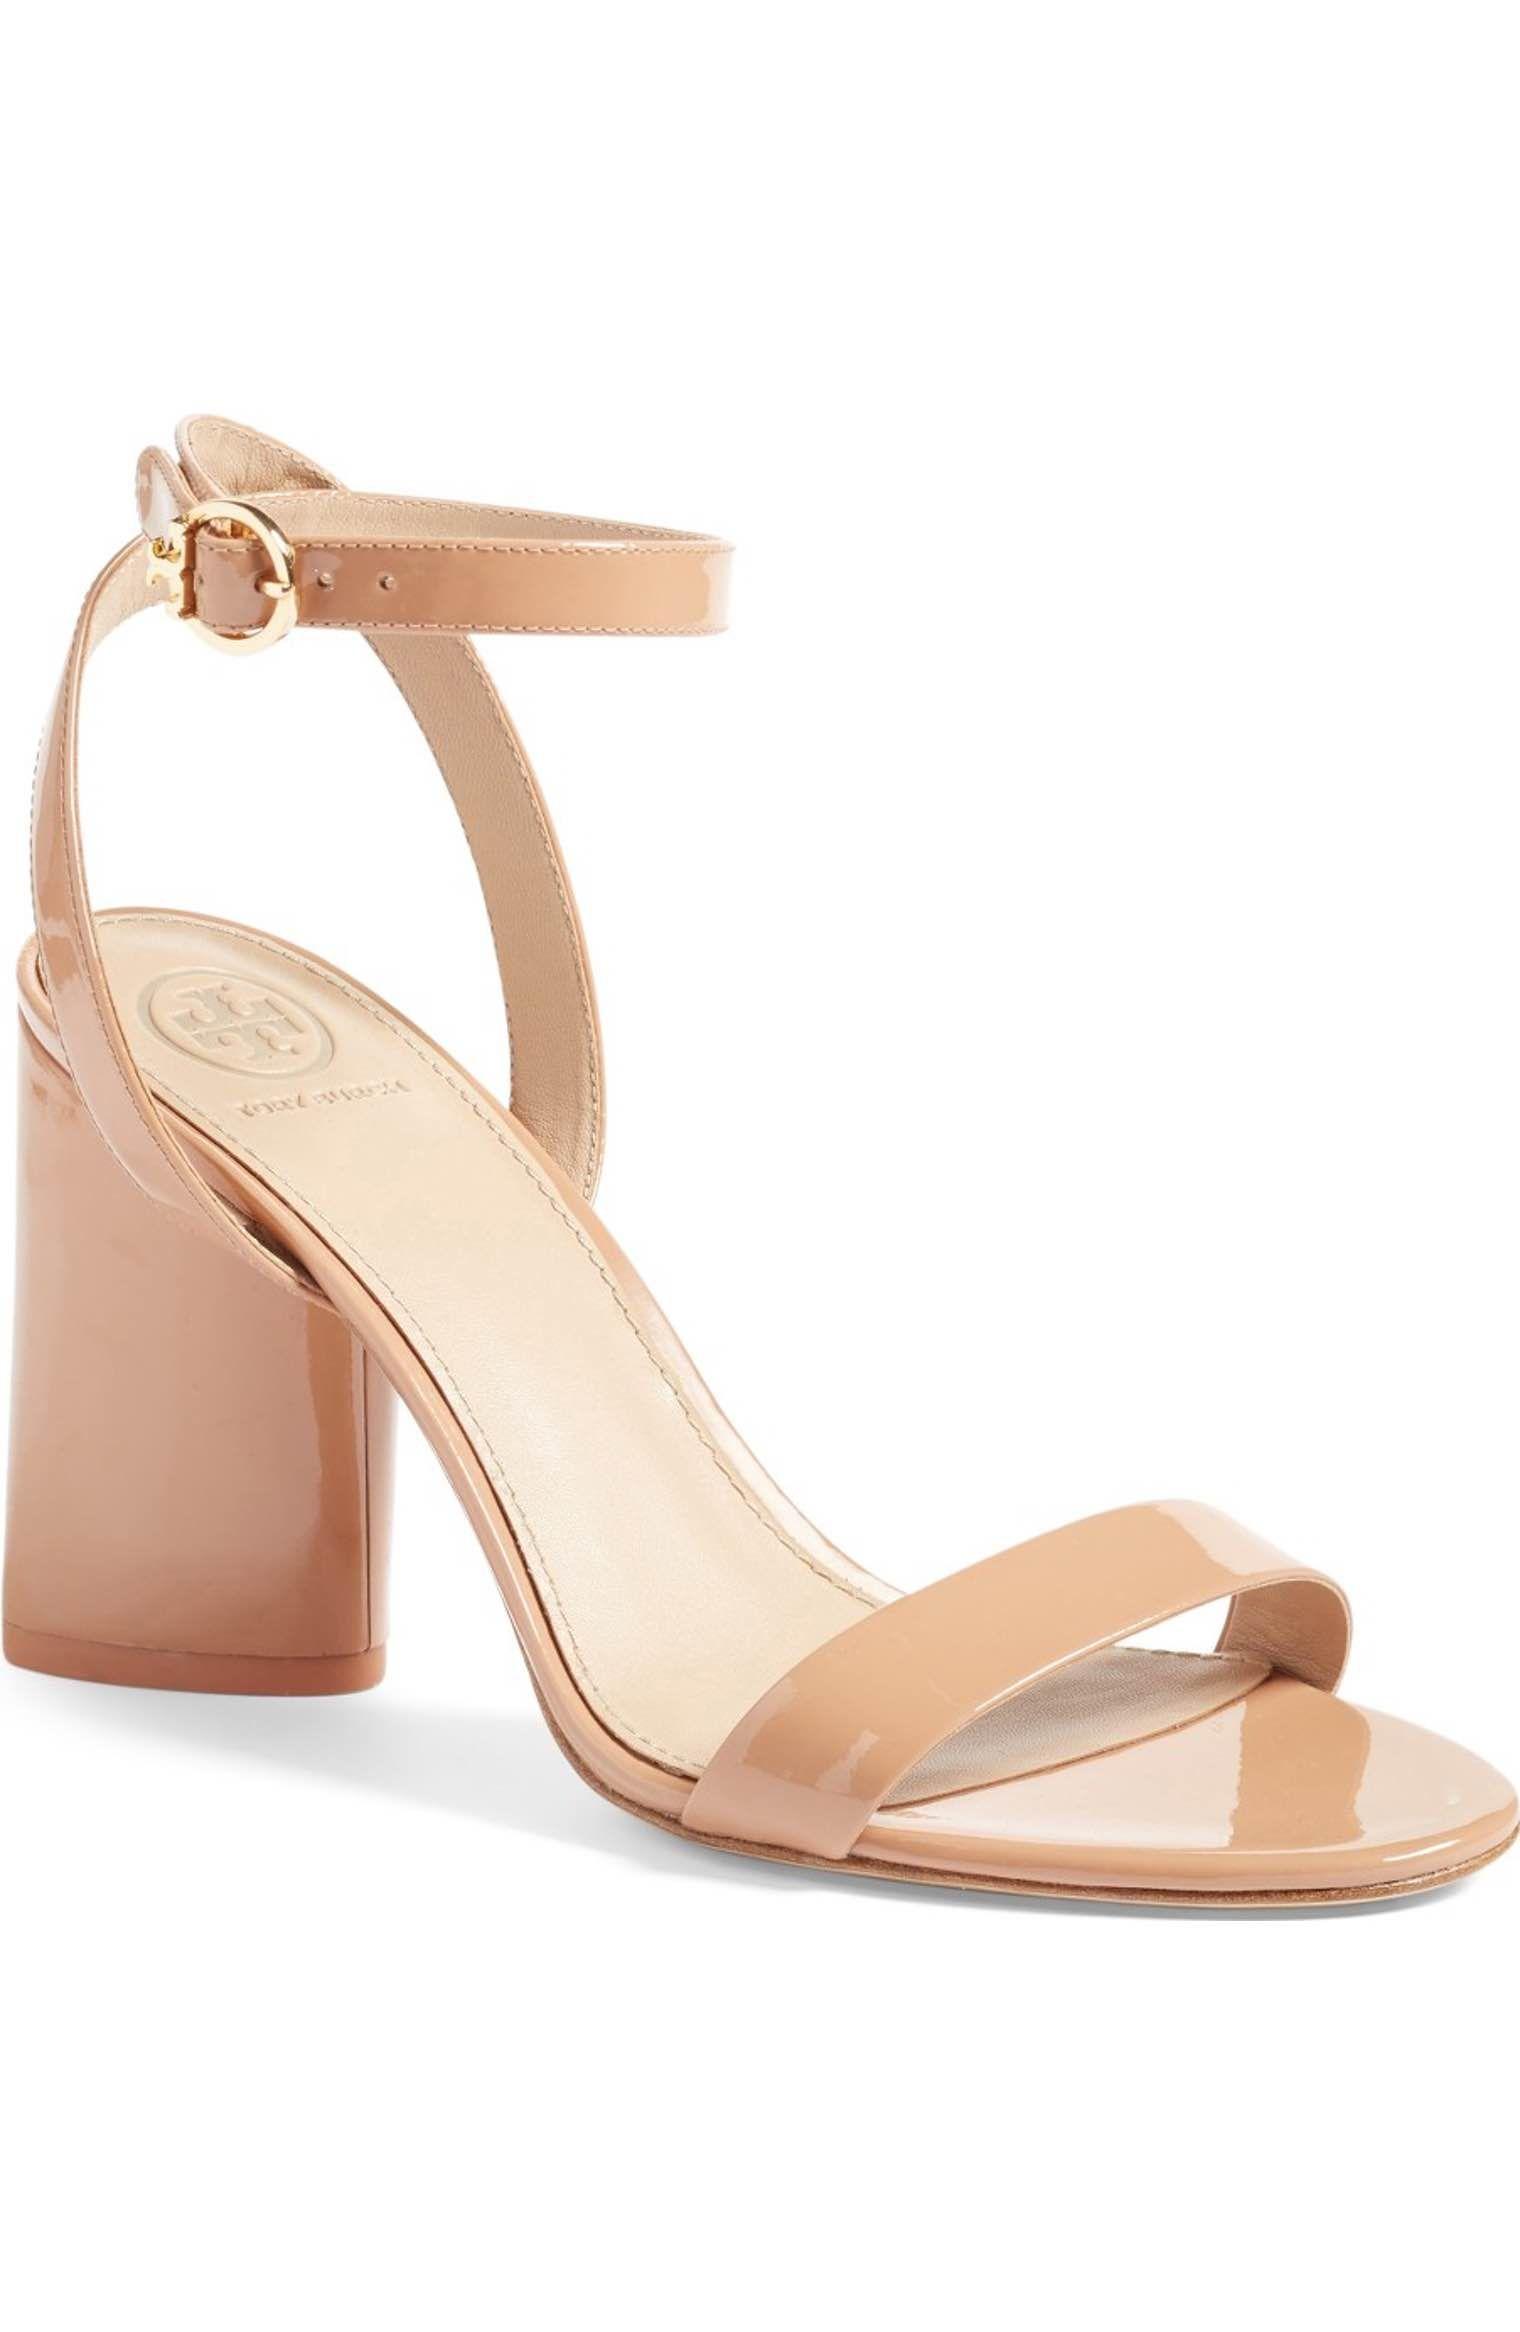 Tory Burch Elizabeth Block Heel Sandal